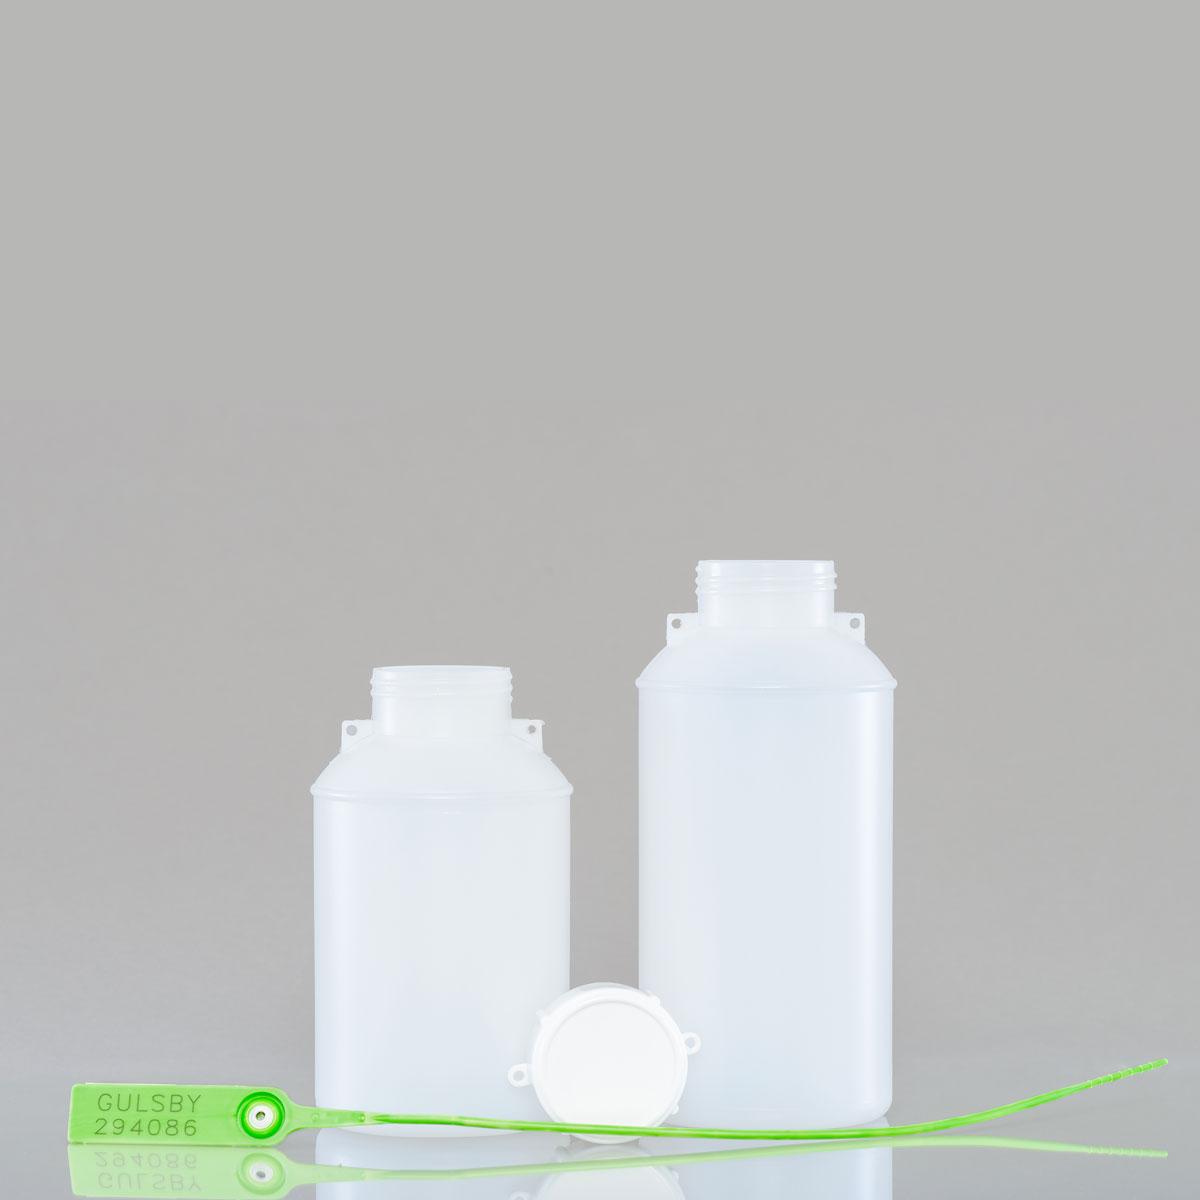 http://fuelsamplebottles.com/wp-content/uploads/gulsby-packaging-043-1200x.jpg